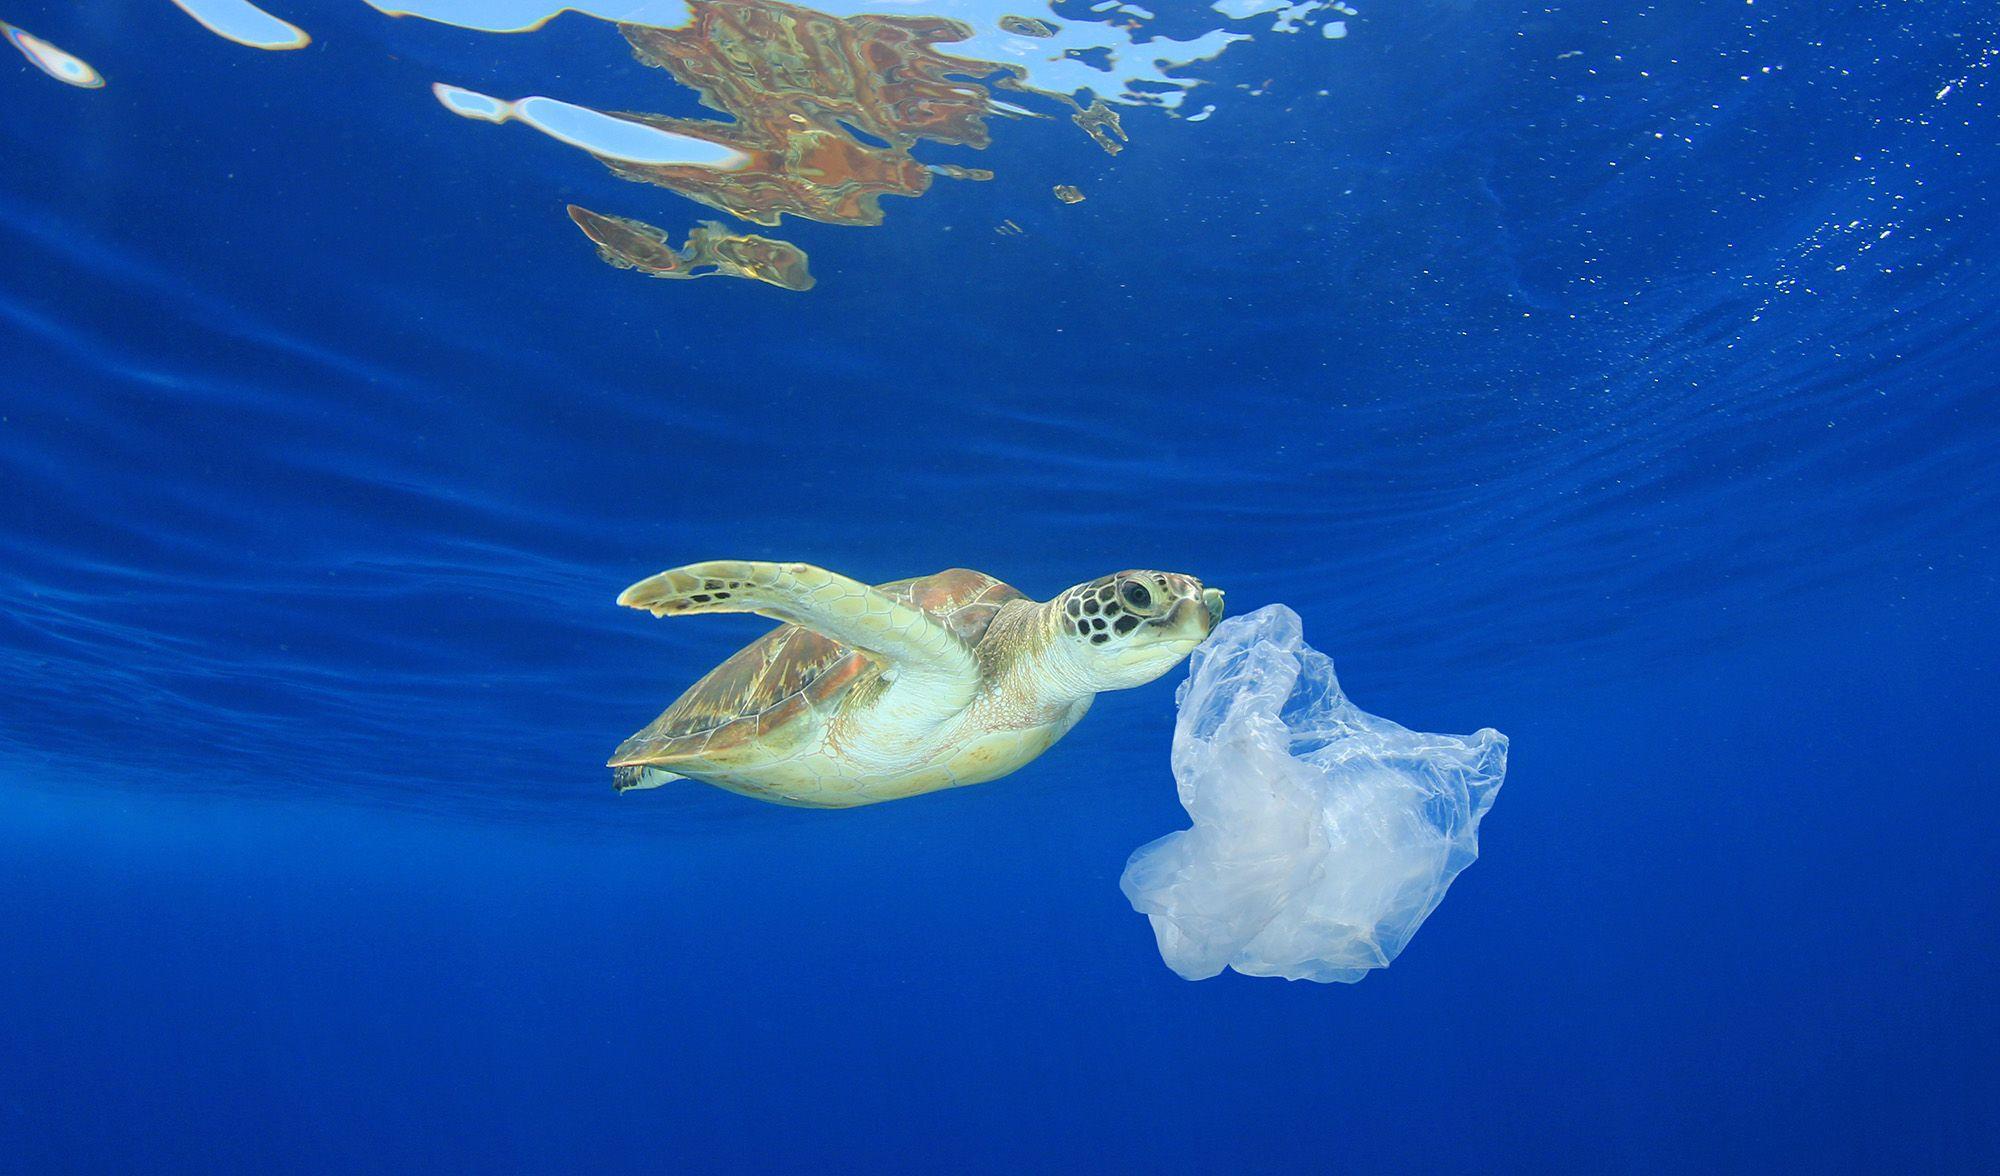 1 dari 5 Penyu Mati Hanya dengan Memakan Sebuah Plastik, Ini Kata Ahli